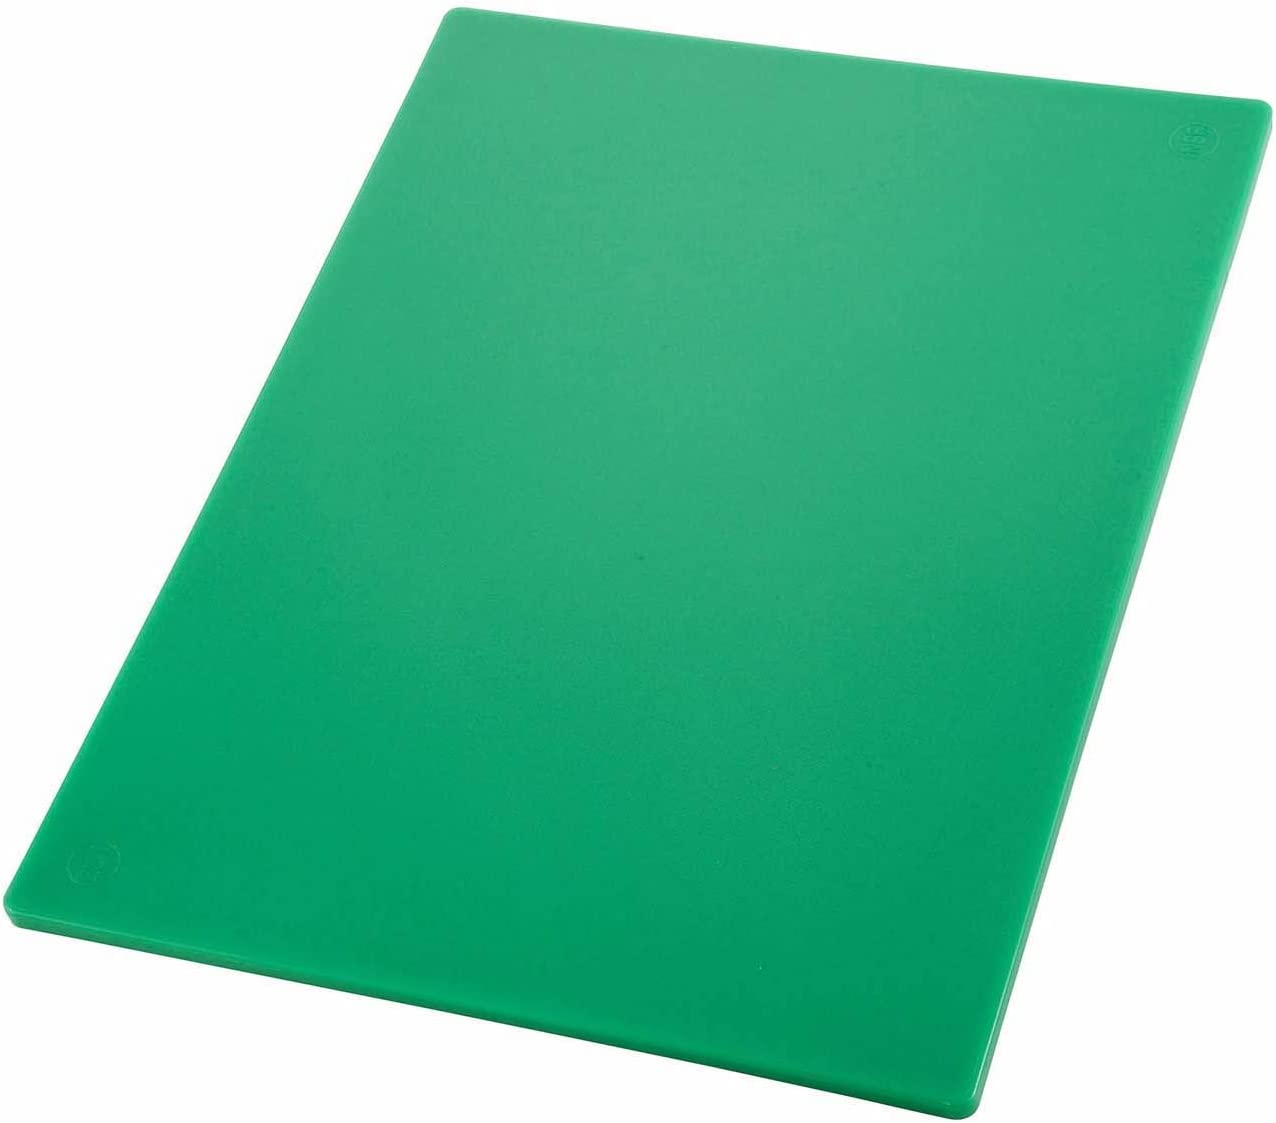 Winco Cutting Board Green 12 by 18 by 1//2-Inch